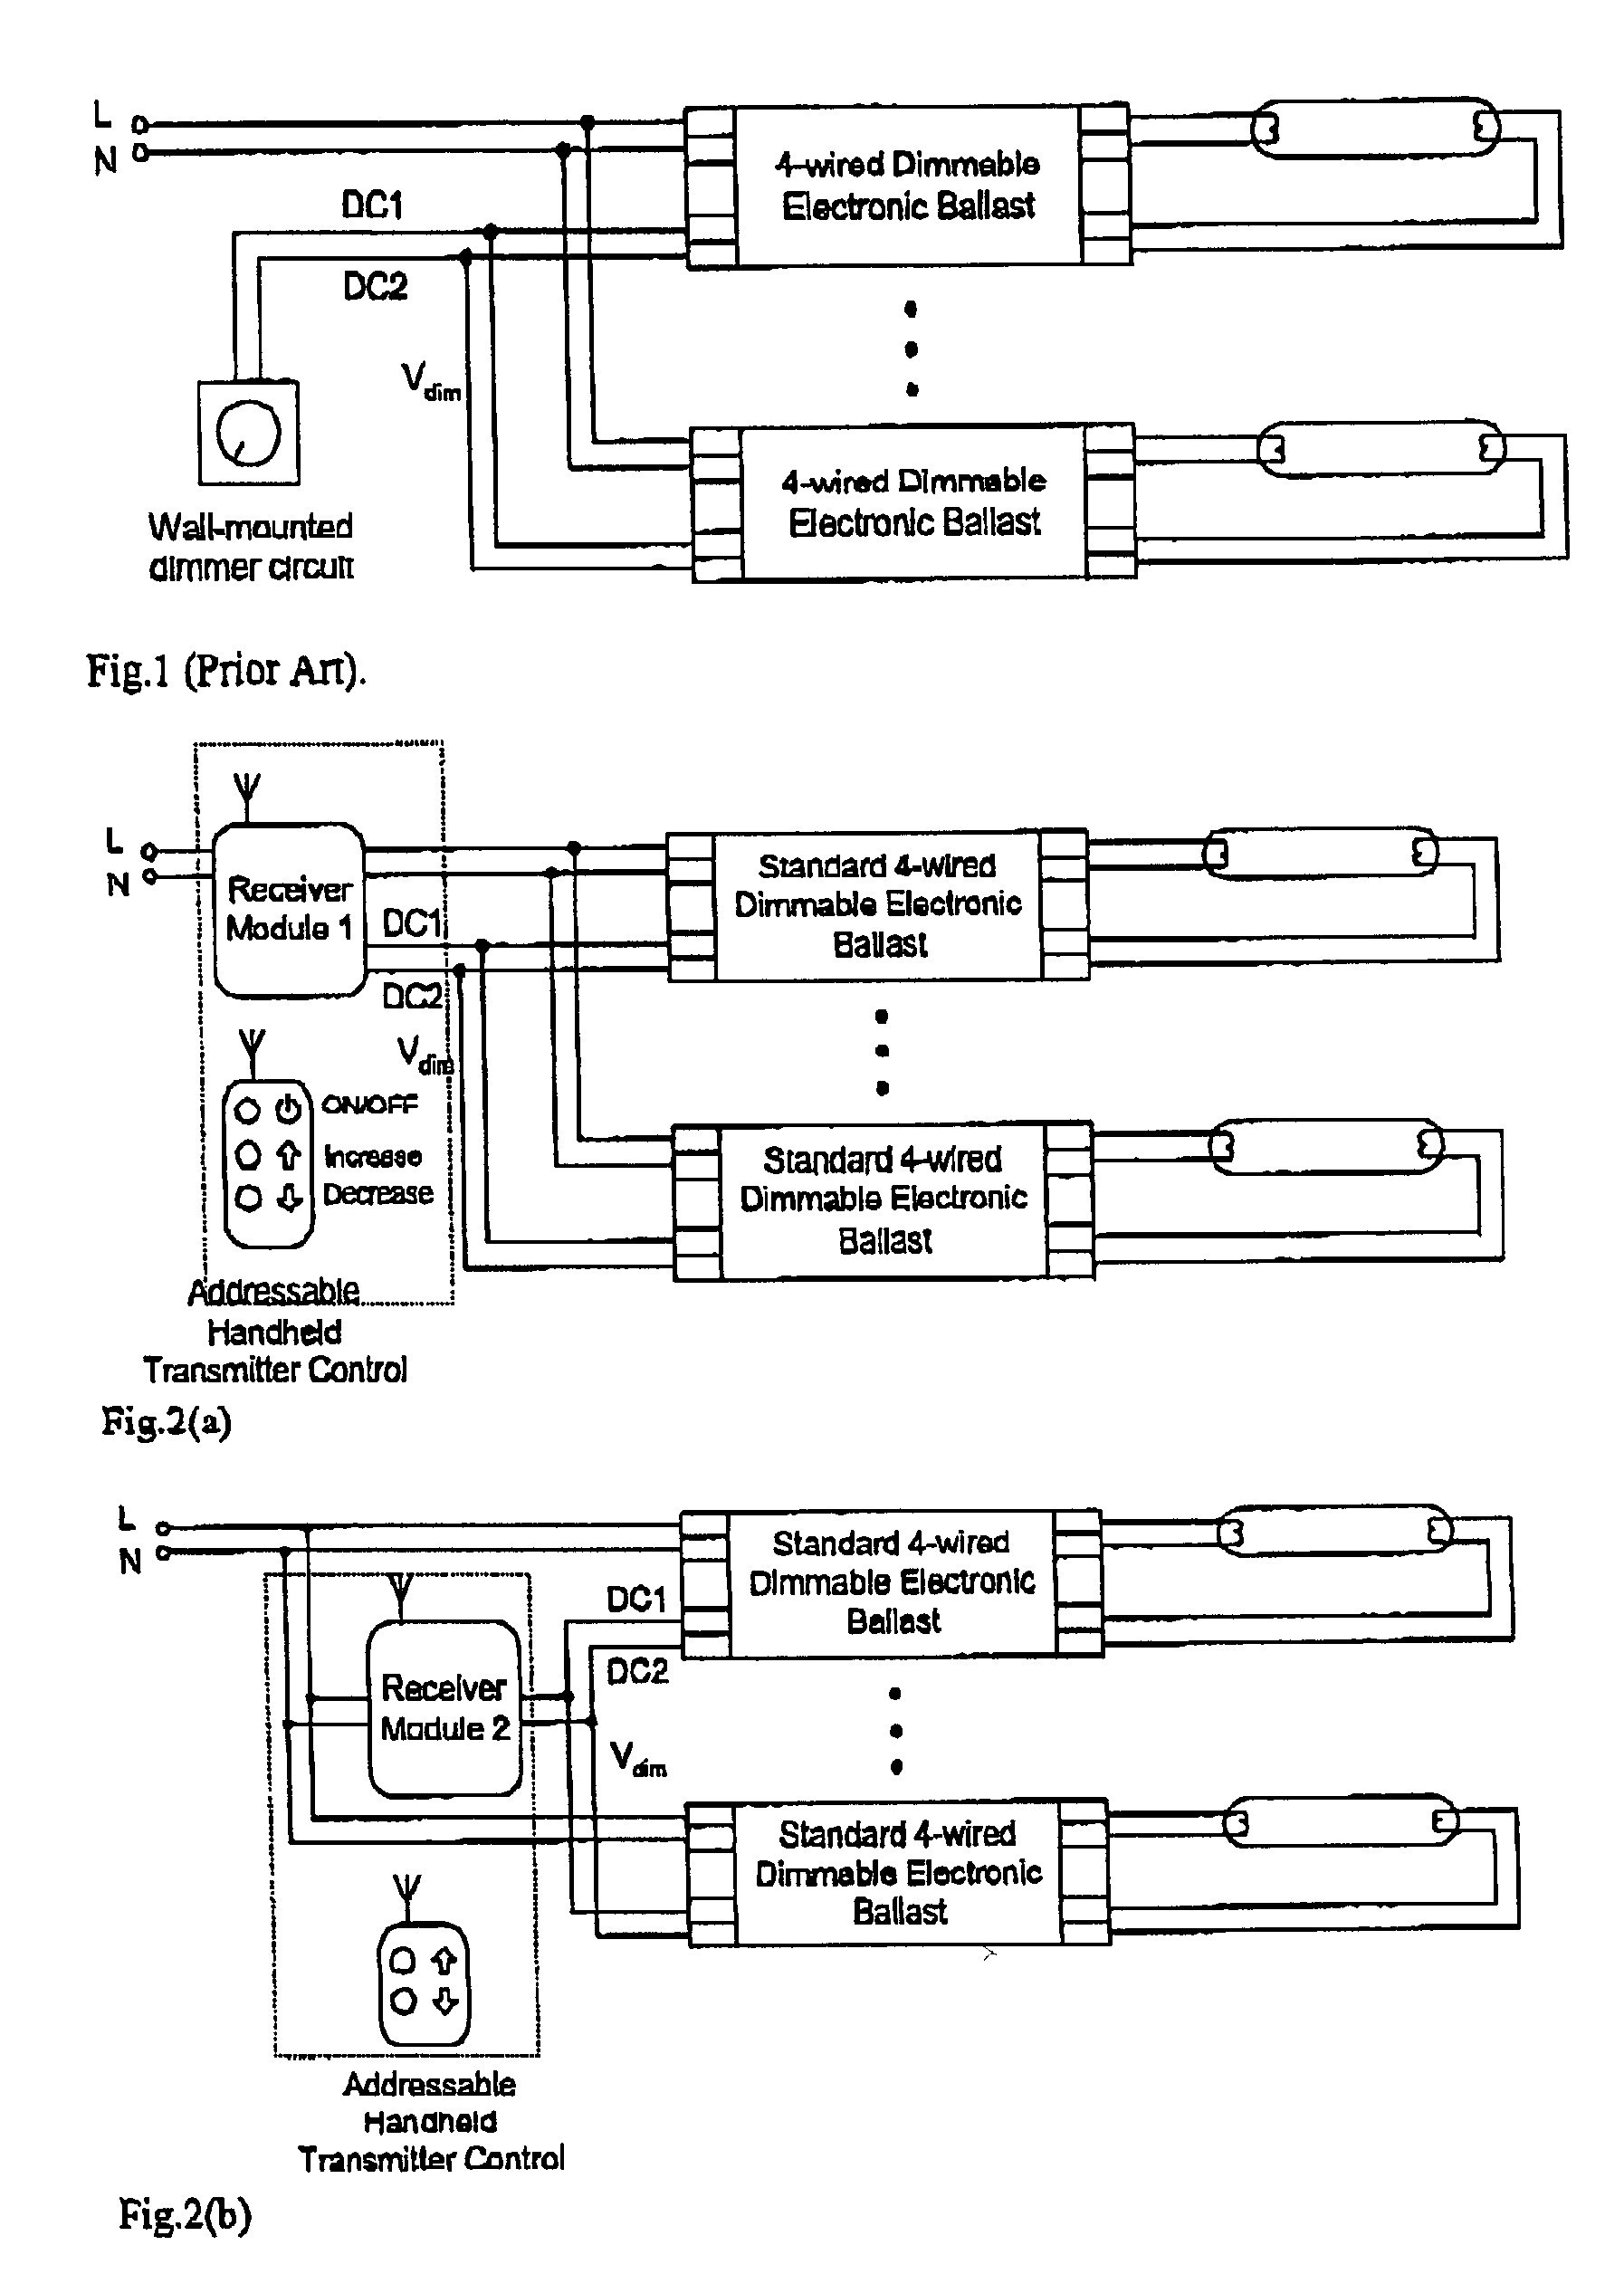 Crestron Wiring Diagrams Explained Cls C6 Diagram Lutron Hyperion Russound Light